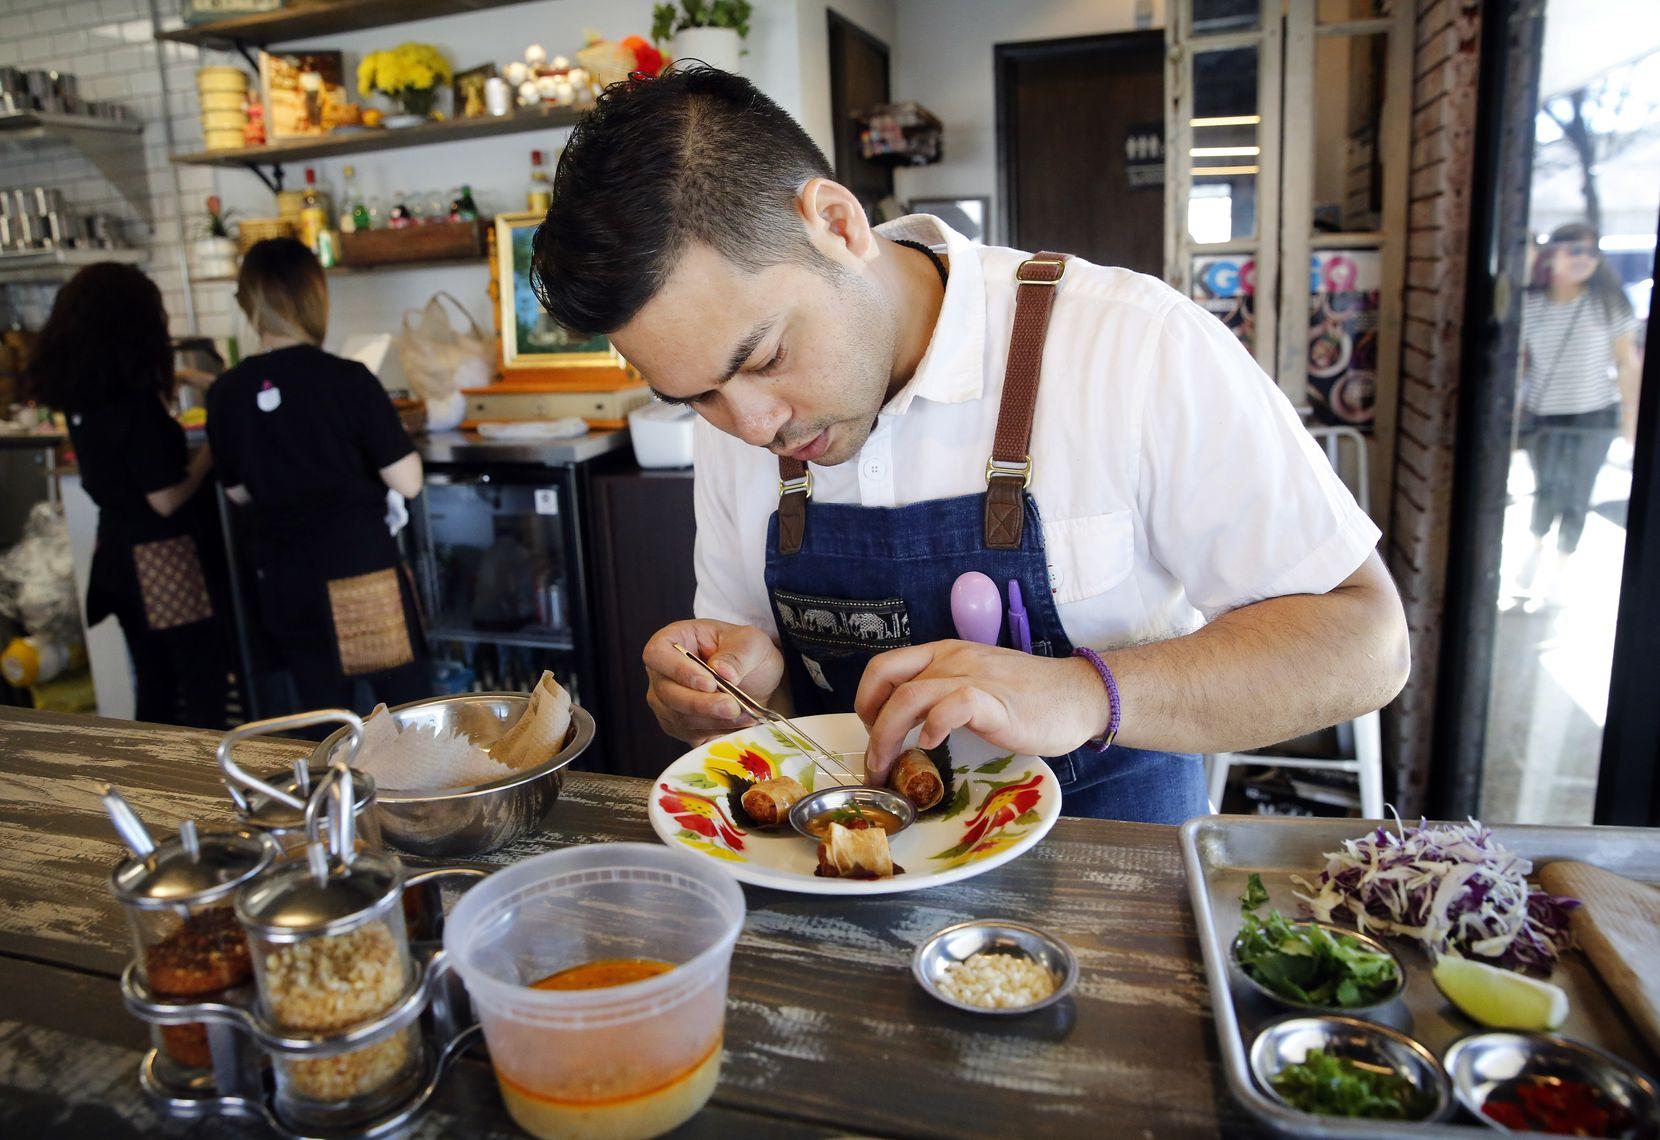 Chef and owner Donny Sirisavath prepares shrimp bites at his Khao Noodle Shop.